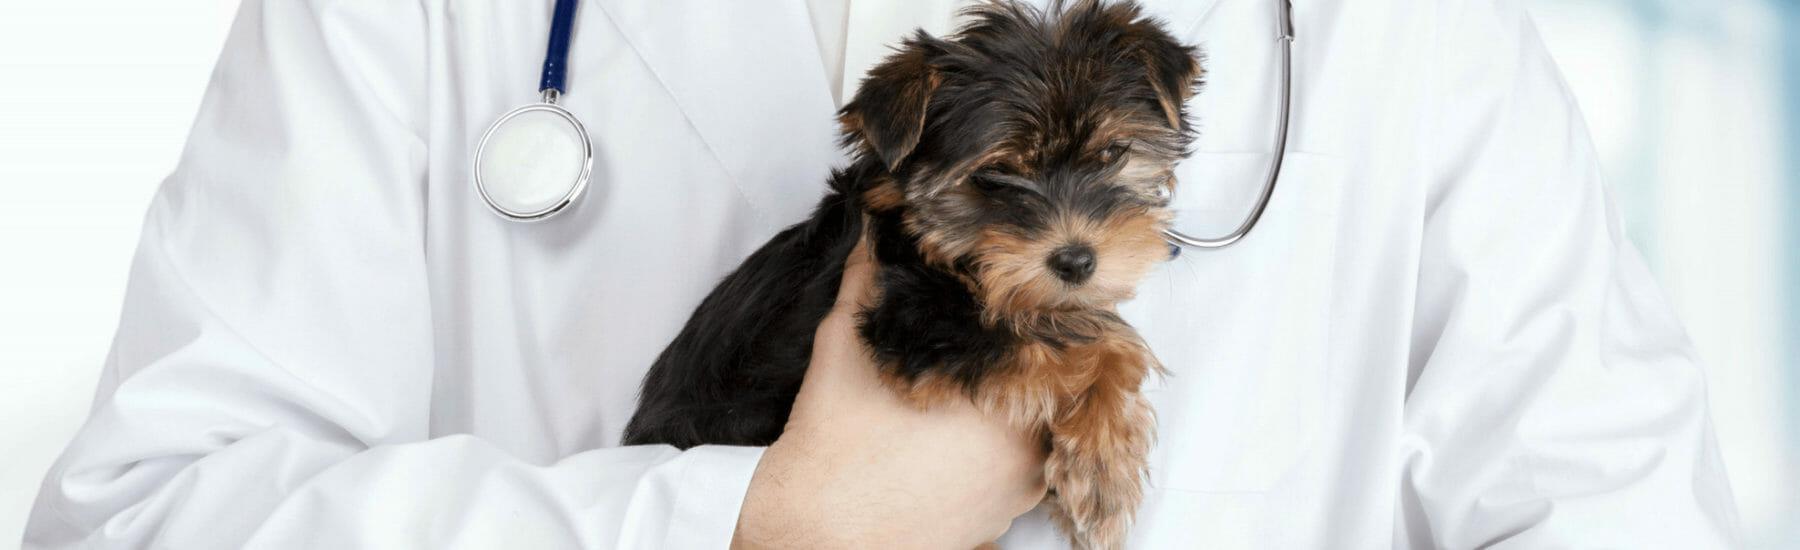 Small black dog being held by veternarian